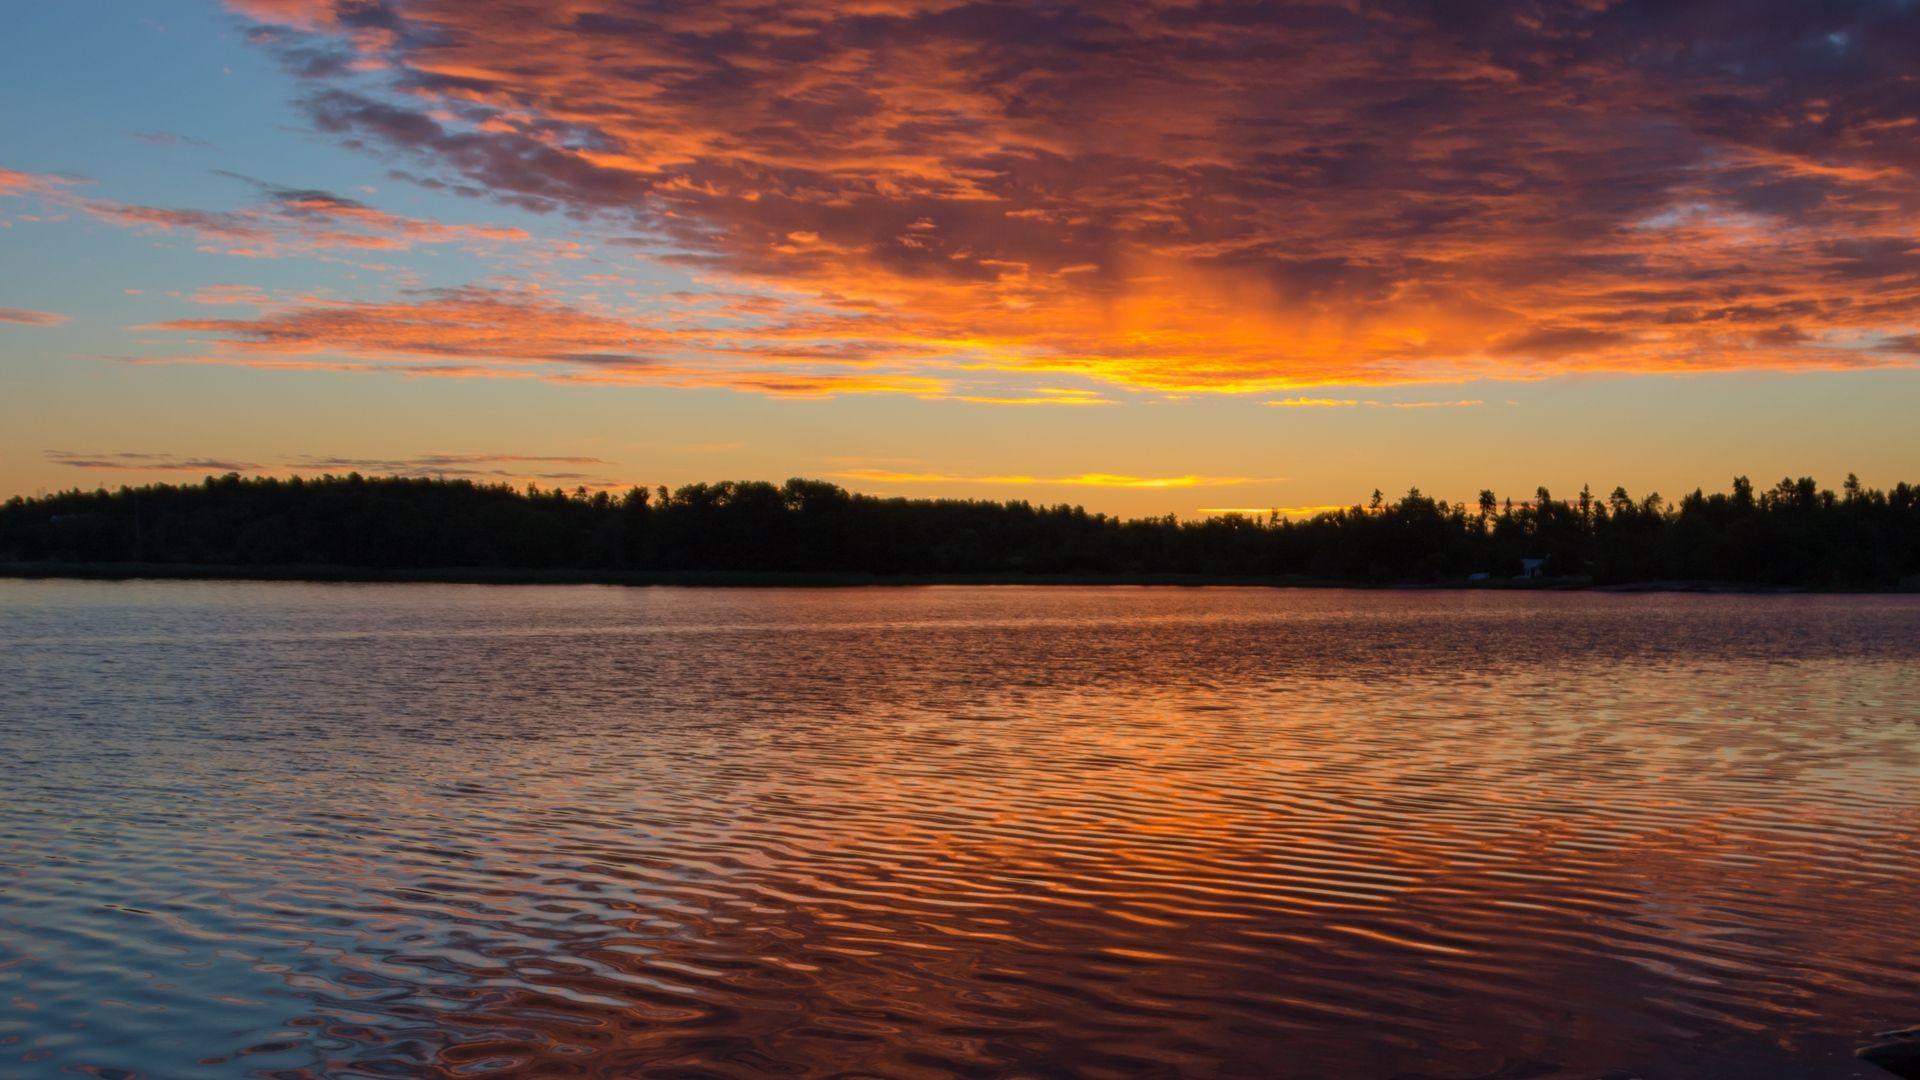 Lake Sunset Archipelago Hd Wallpaper Lake Sunset Island Heights Sunset Wallpaper sunset lake ice evening sky